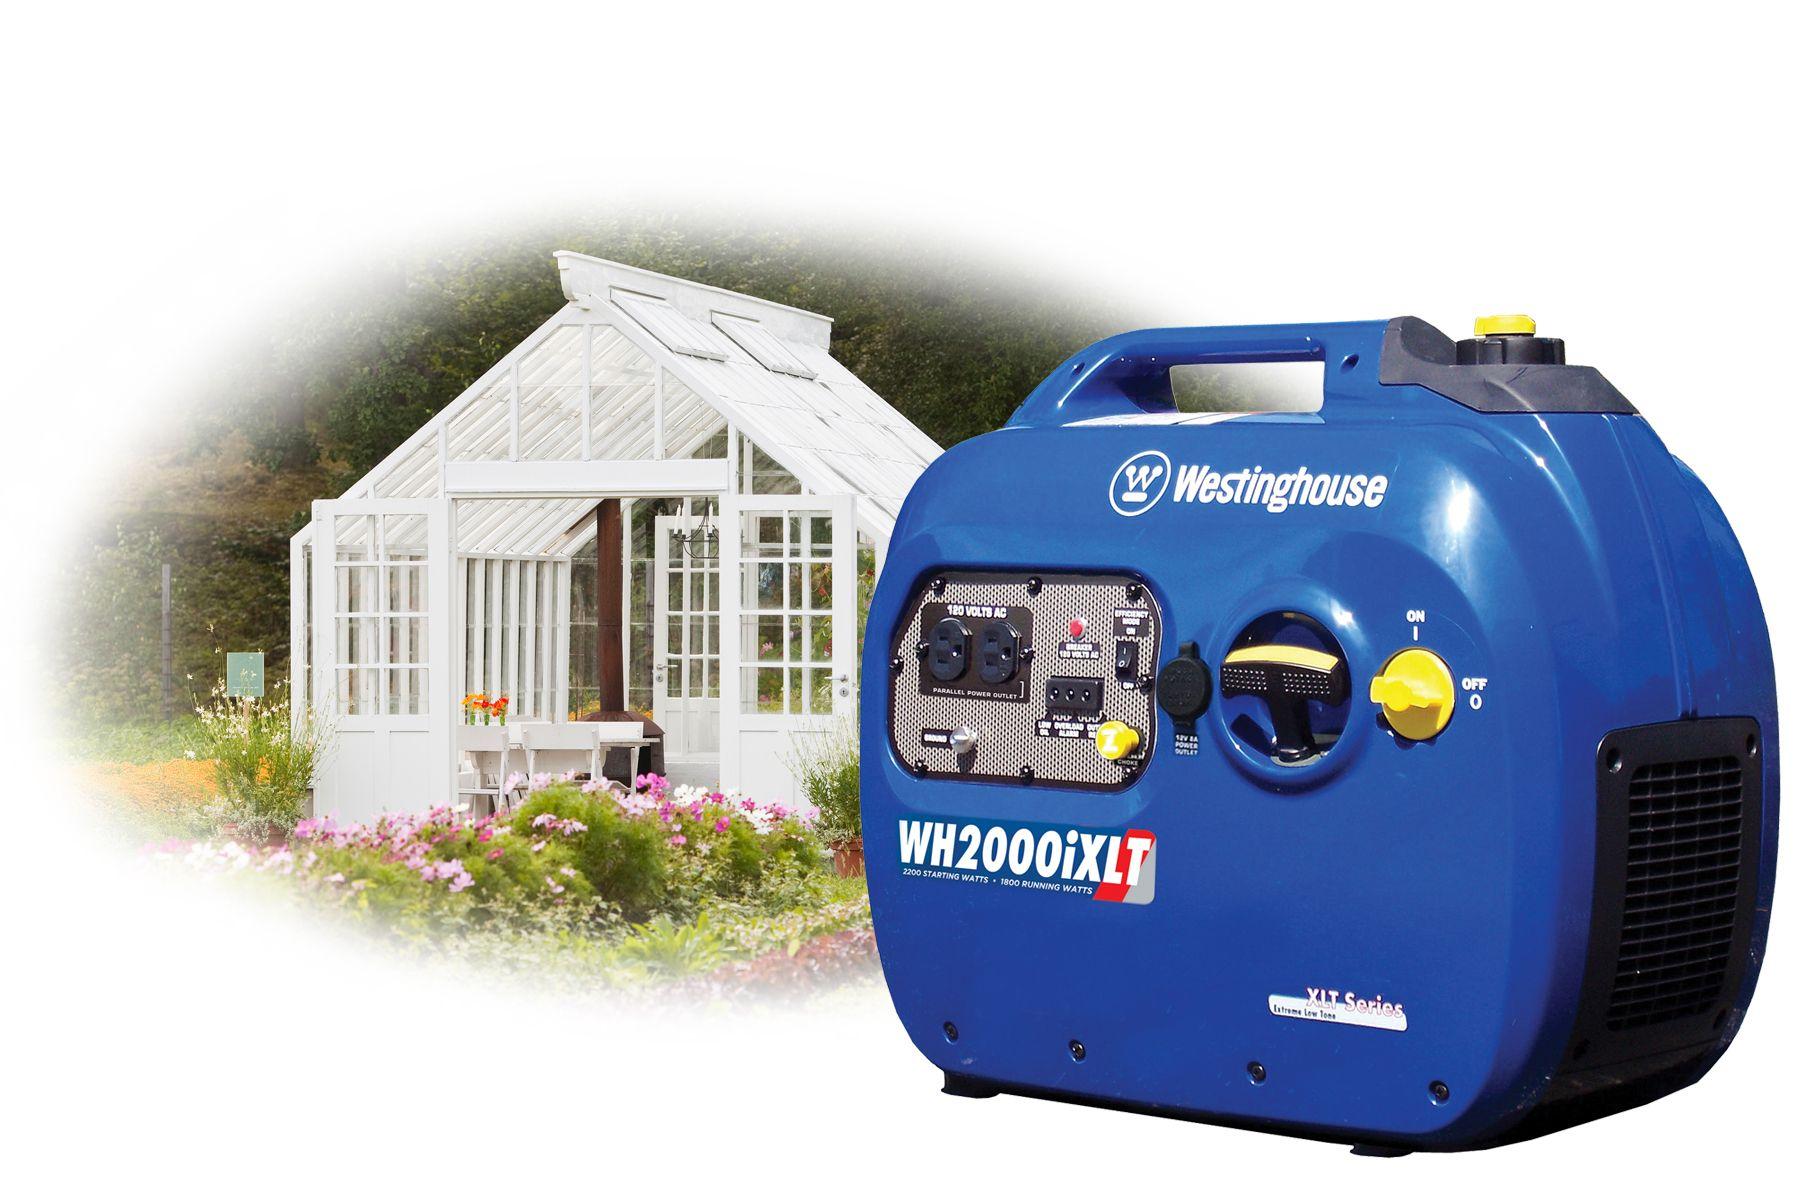 A Portable Generator Makes Sense for a Small Greenhouse